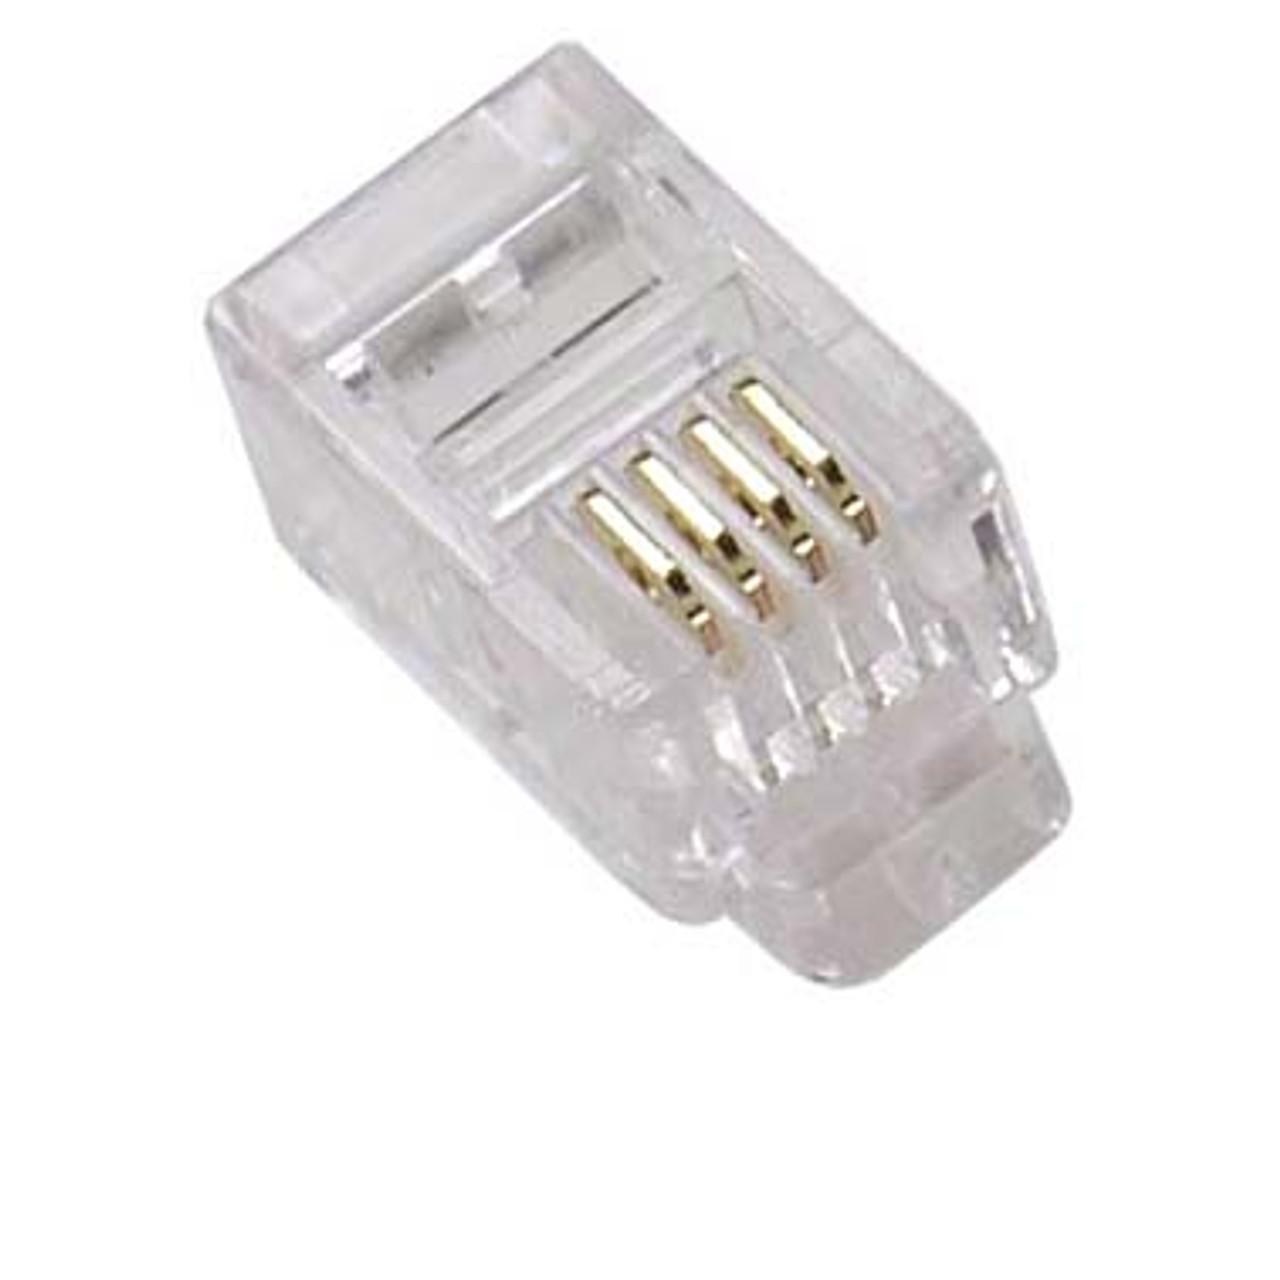 rj22 connector wiring 300 062 modular handset plug 4p4c telephone handset plug  300 062 modular handset plug 4p4c